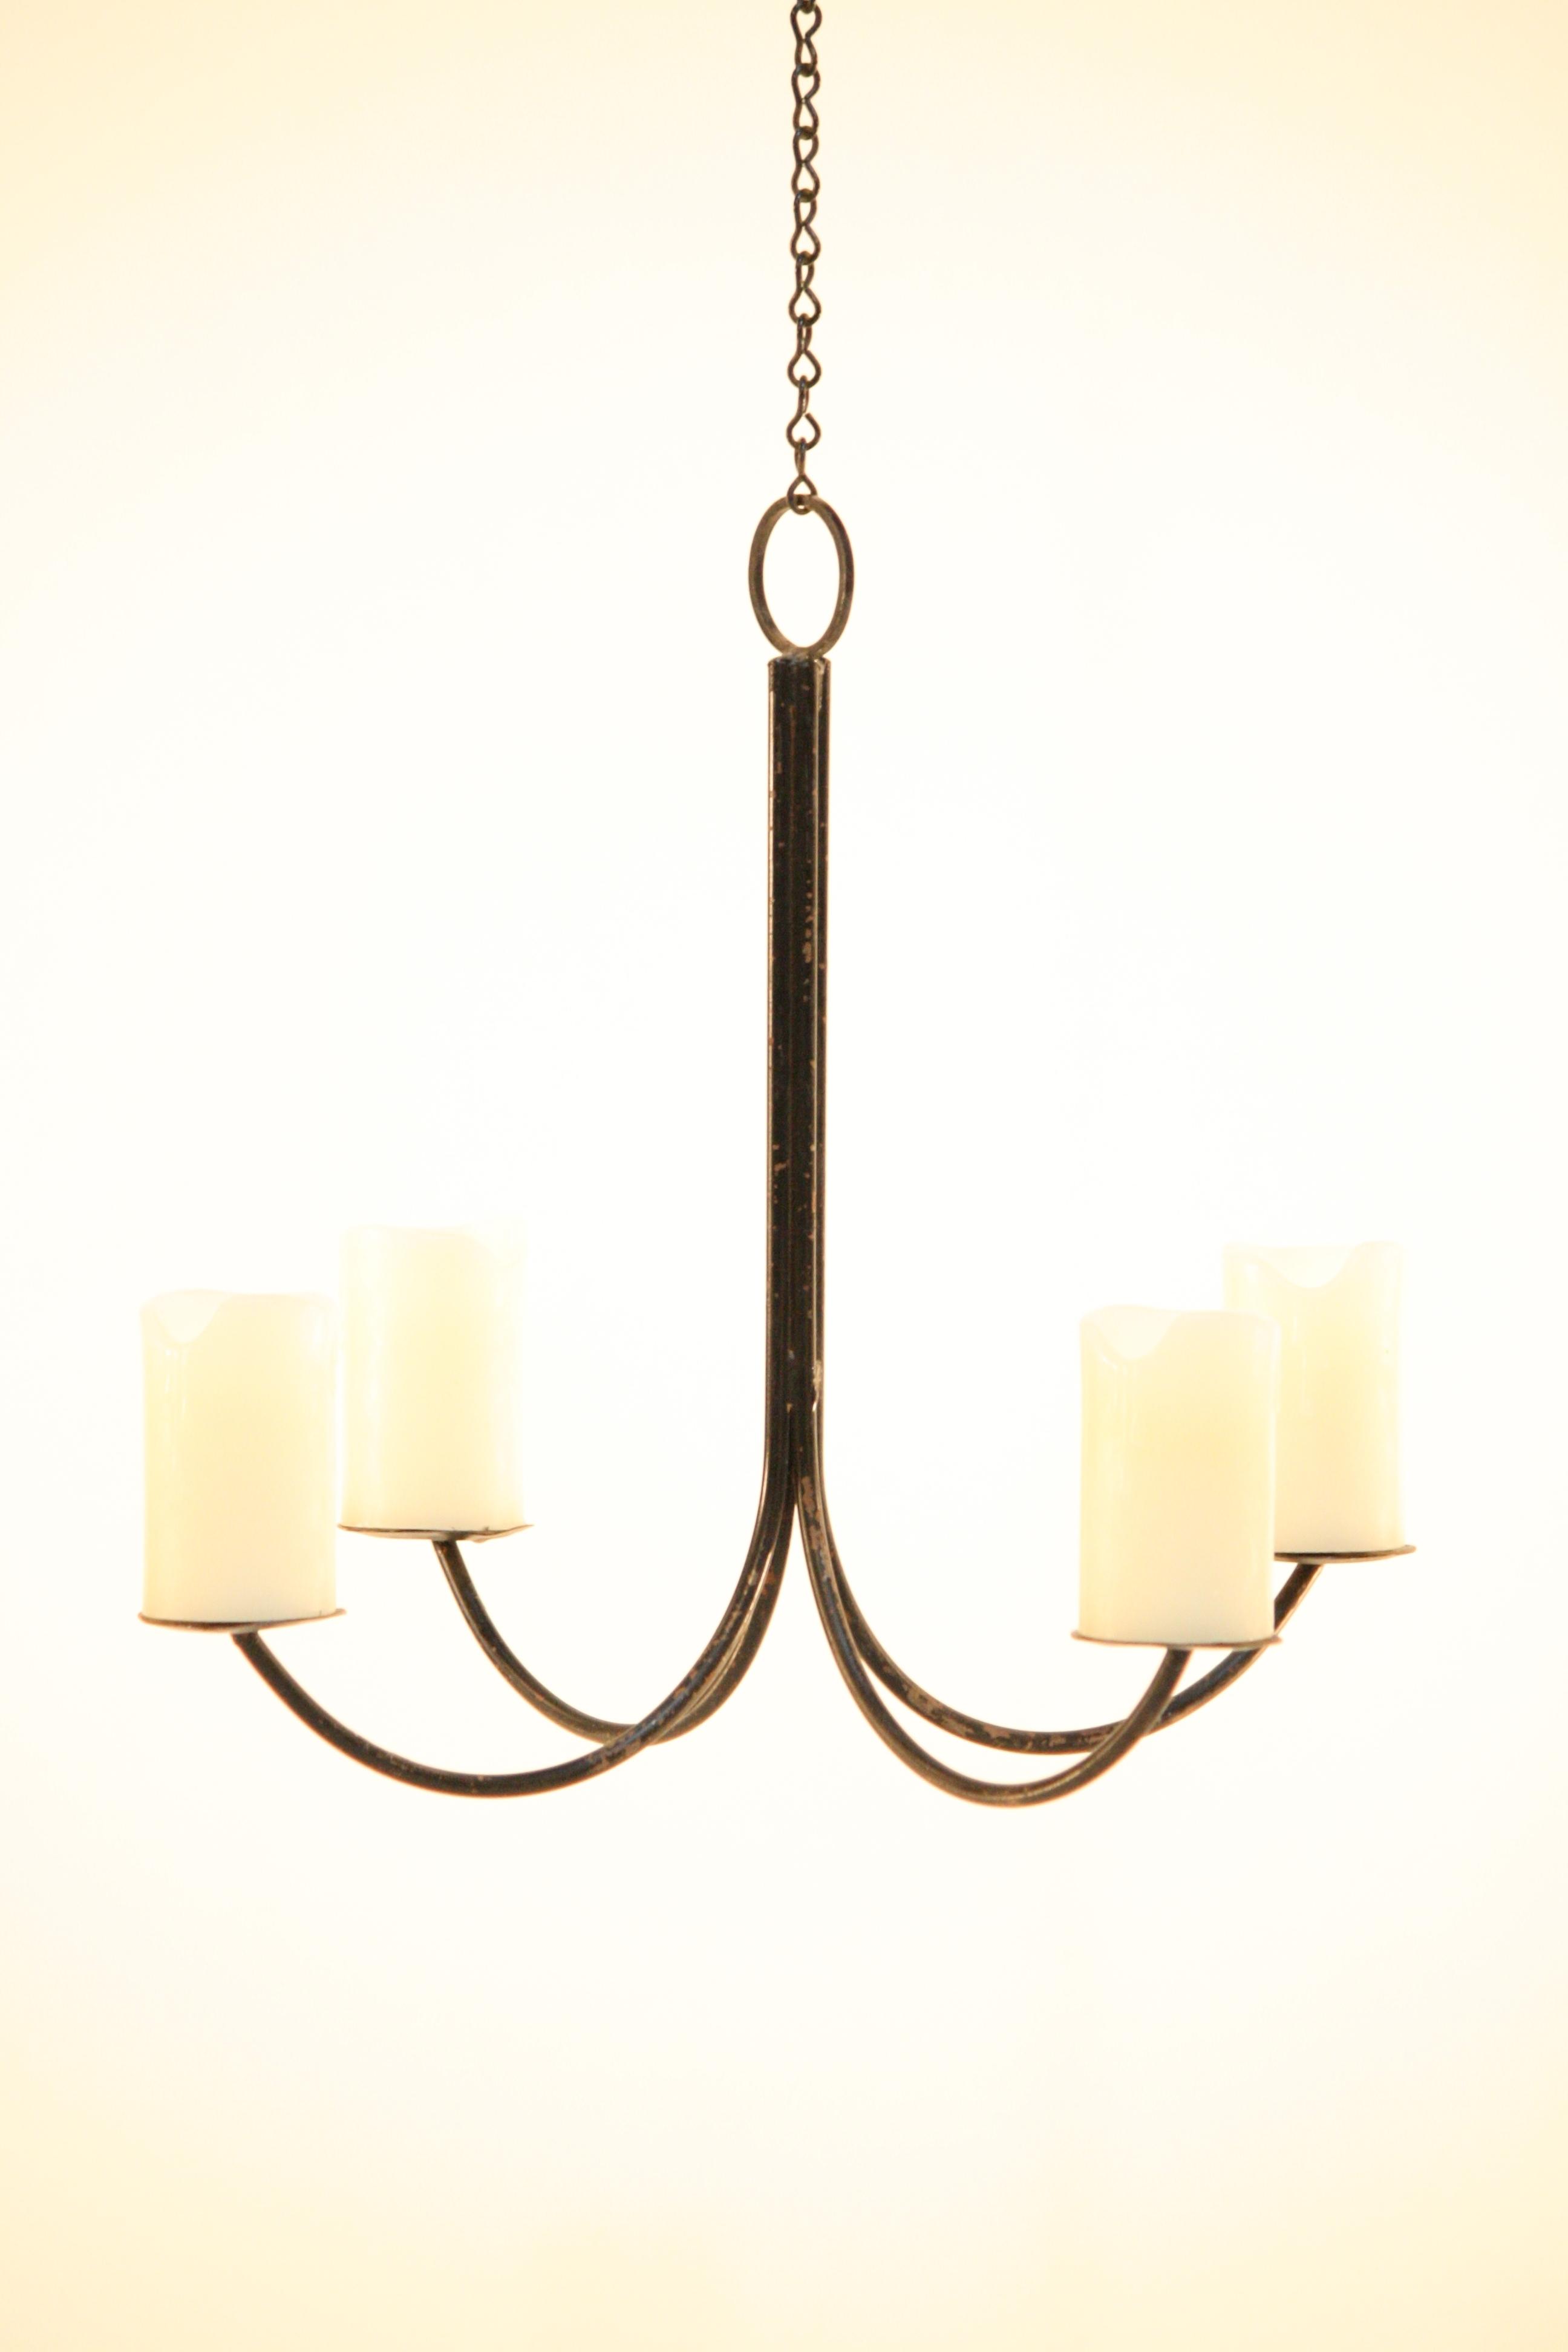 Hanging Candle Chandelier Uk – Chandelier Designs Within Most Recent Hanging Candle Chandeliers (View 10 of 20)